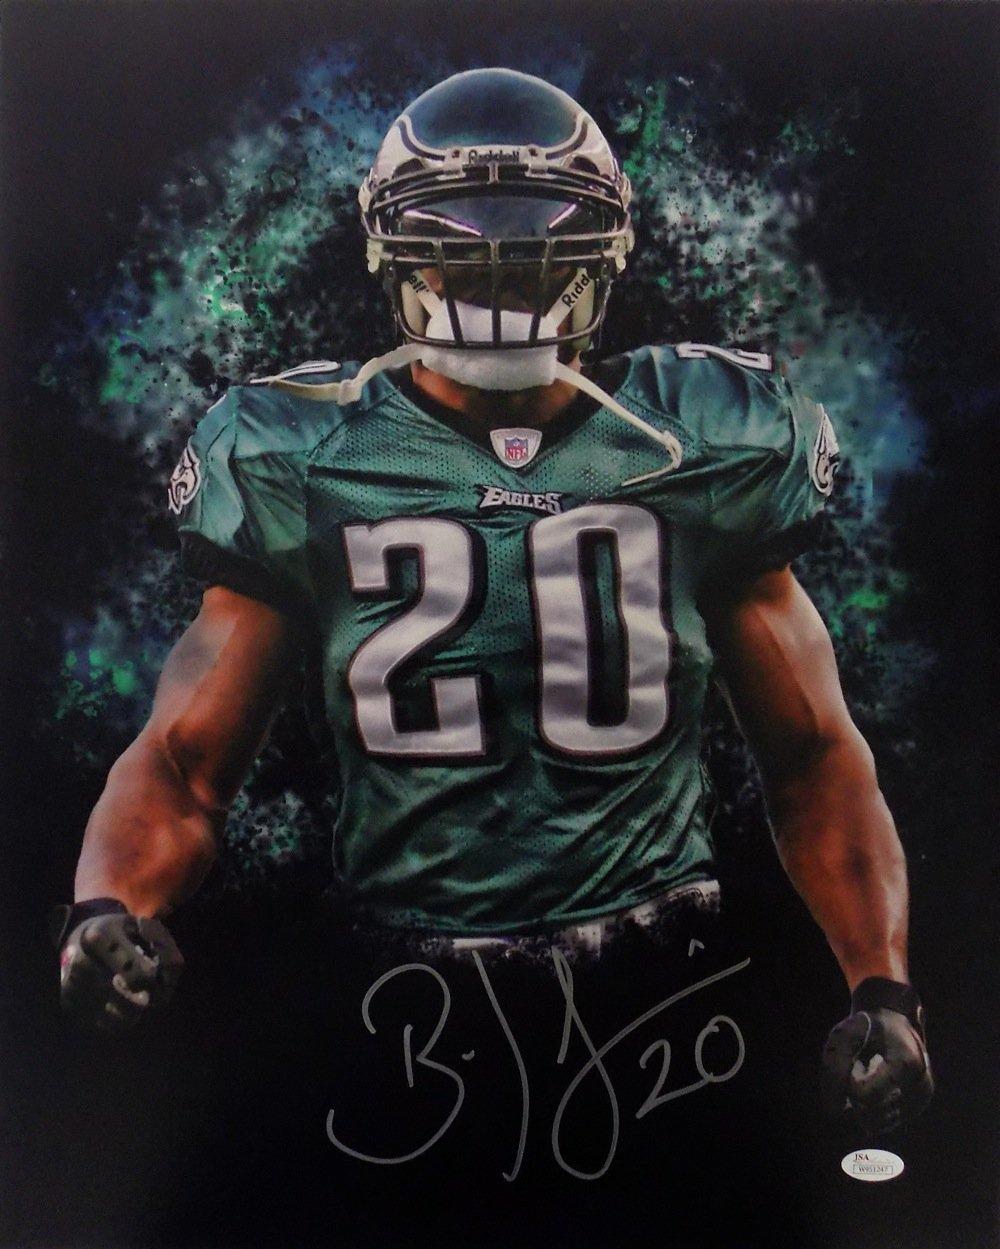 aa29cf91e4f Brian Dawkins Philadelphia Eagles Signed 16x20 Green Smoke Photo JSA  1000x1249